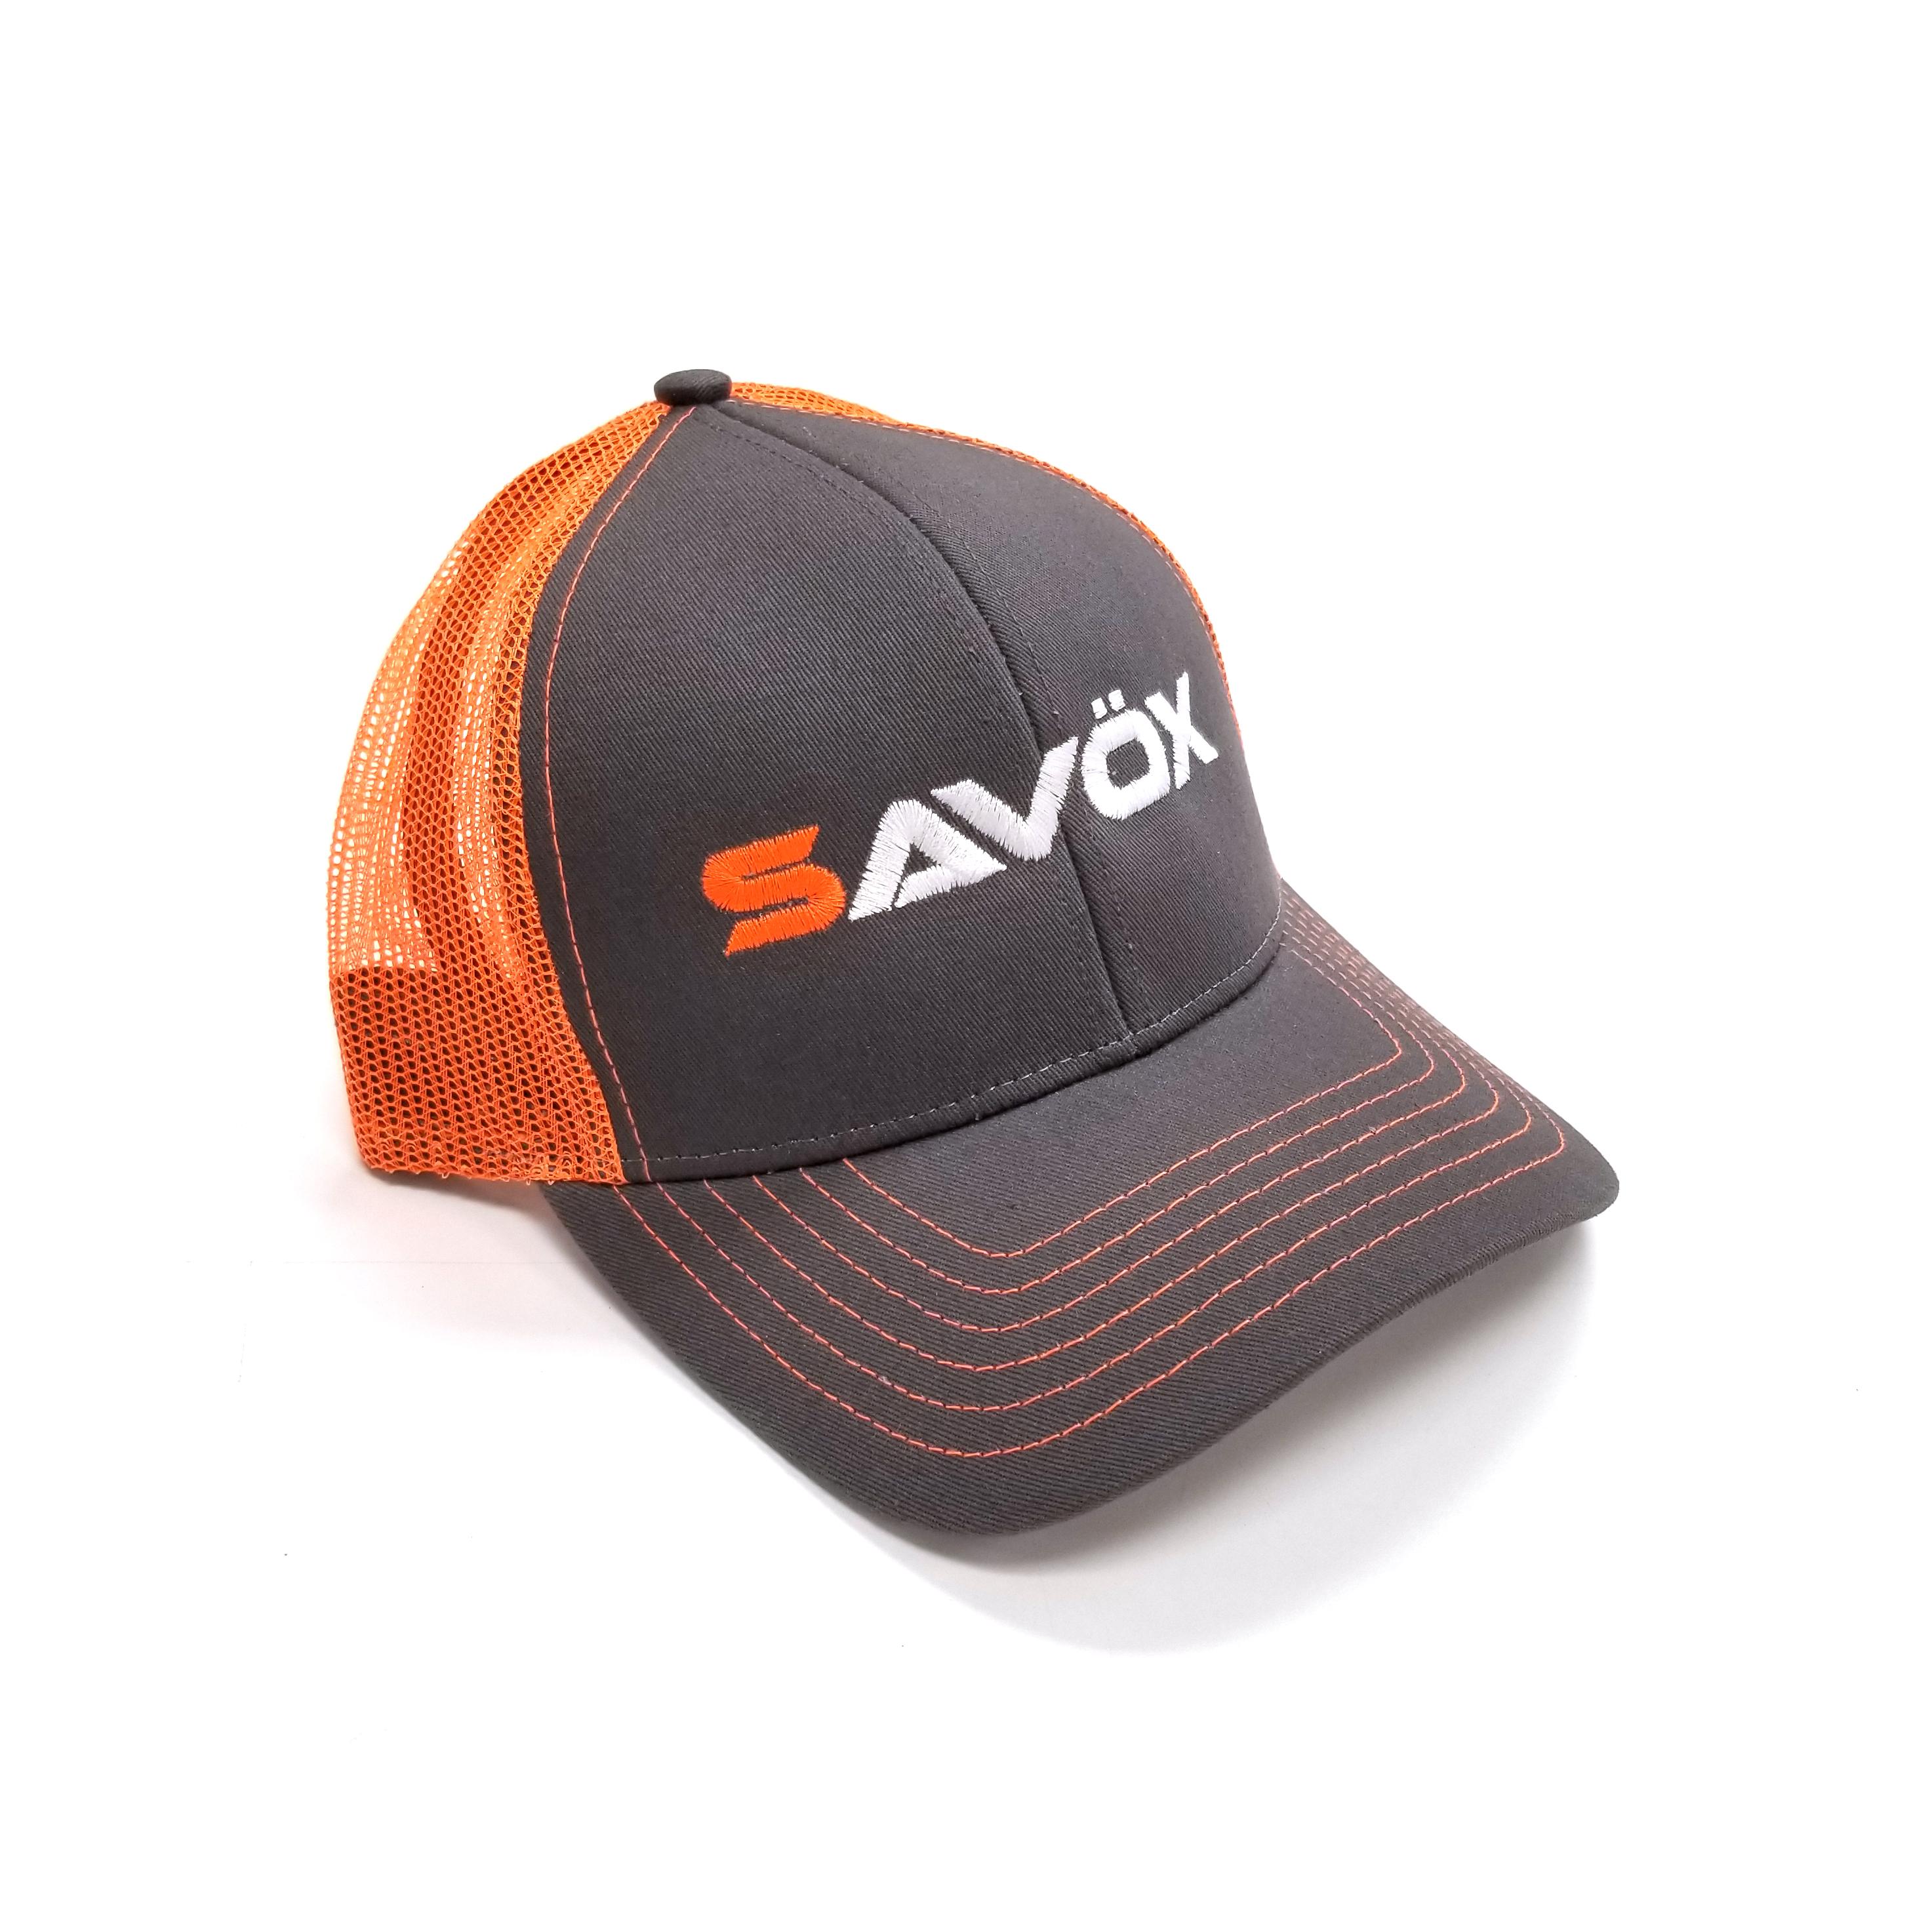 Mesh Back Trucker Cap Hat